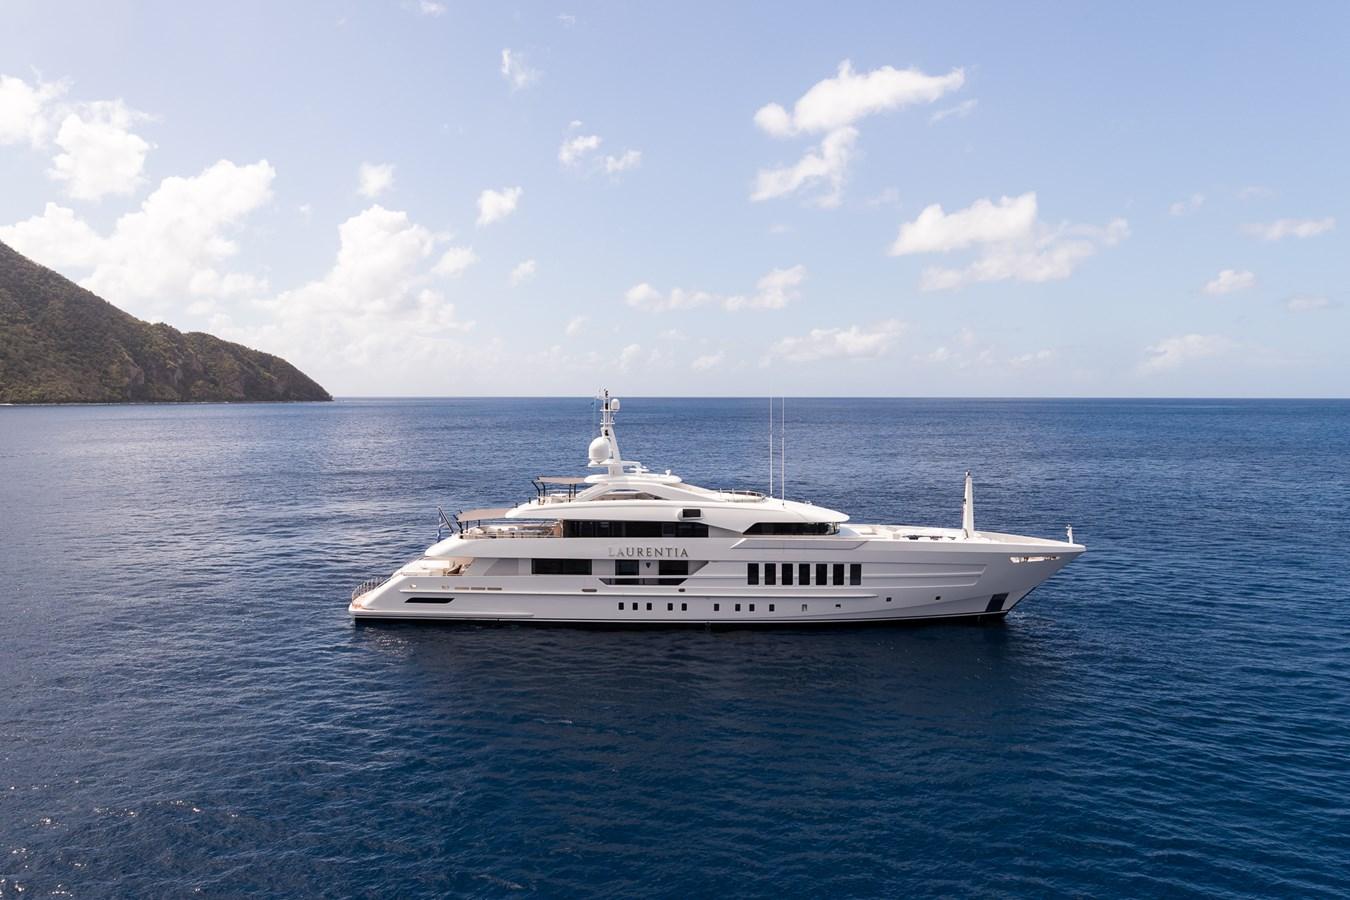 LAURENTIA yacht for sale